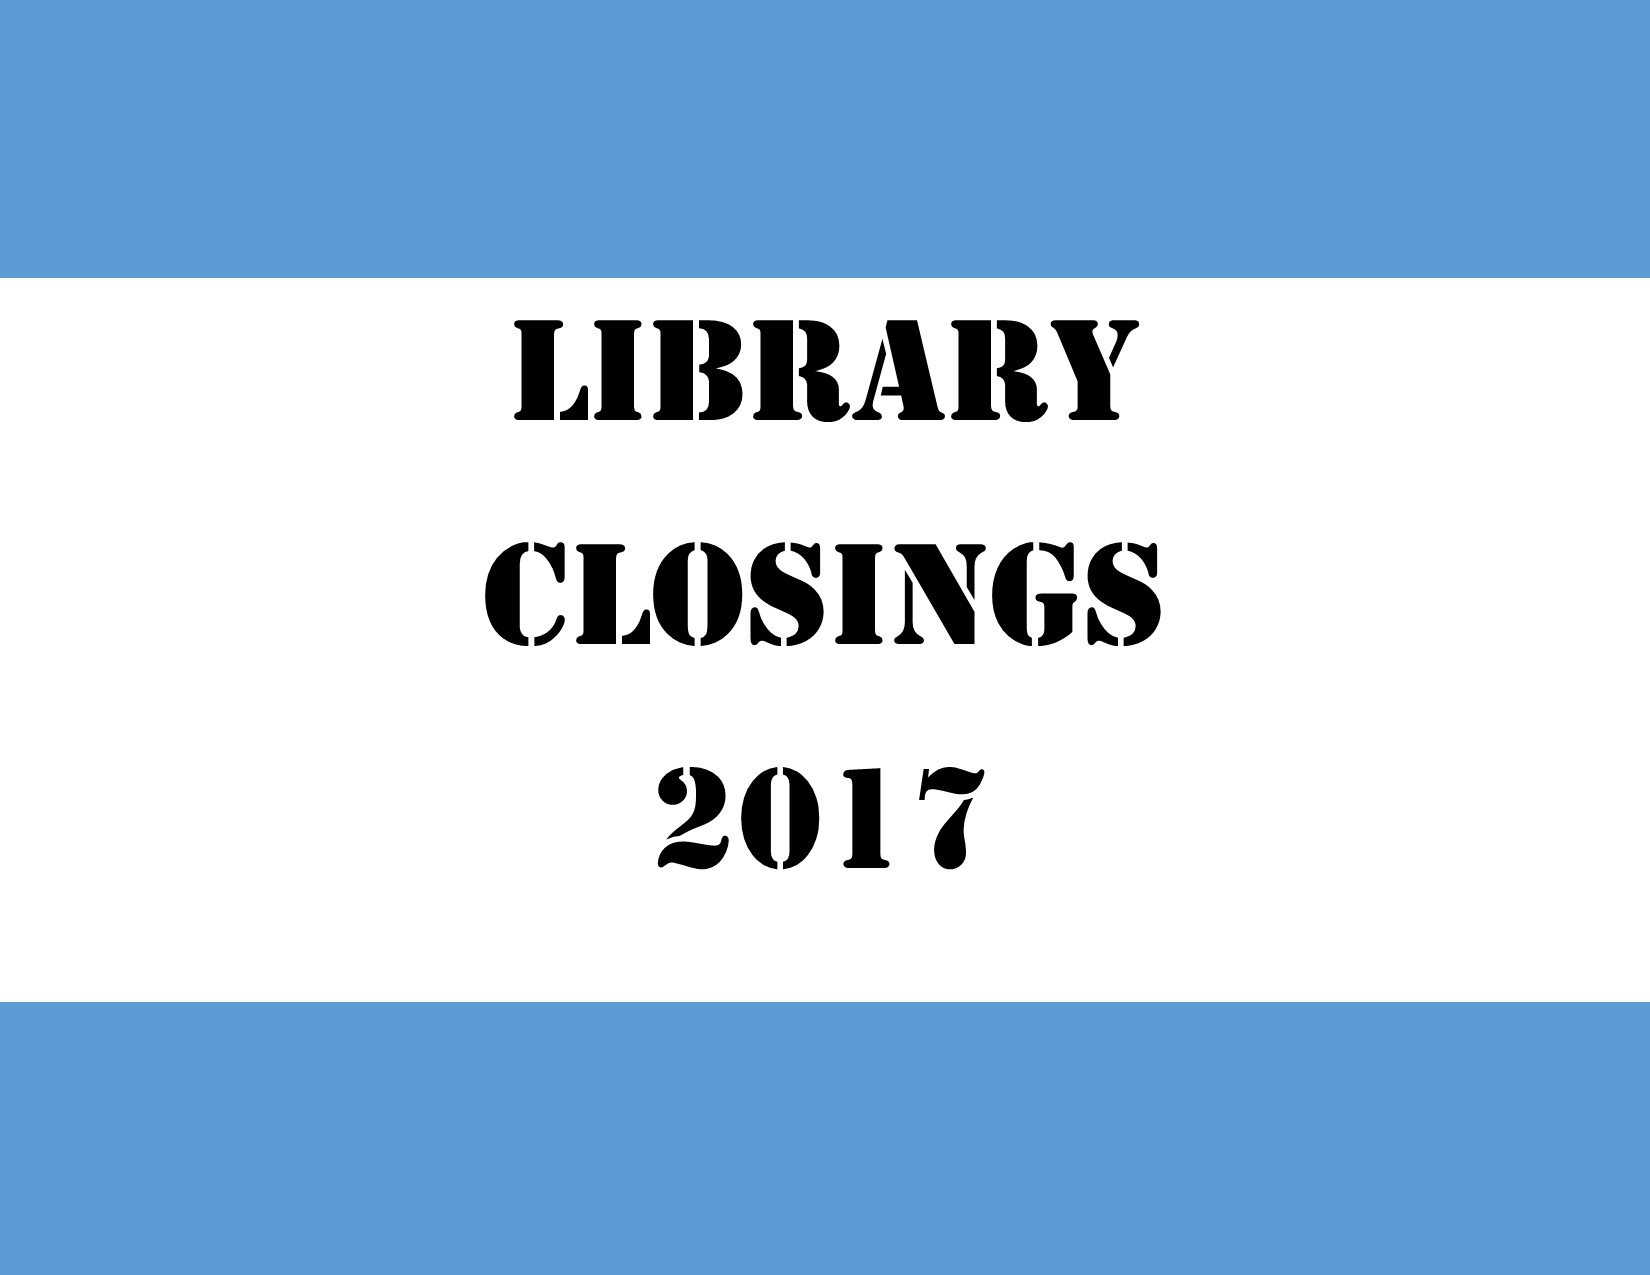 libraryclosingsign17.jpg